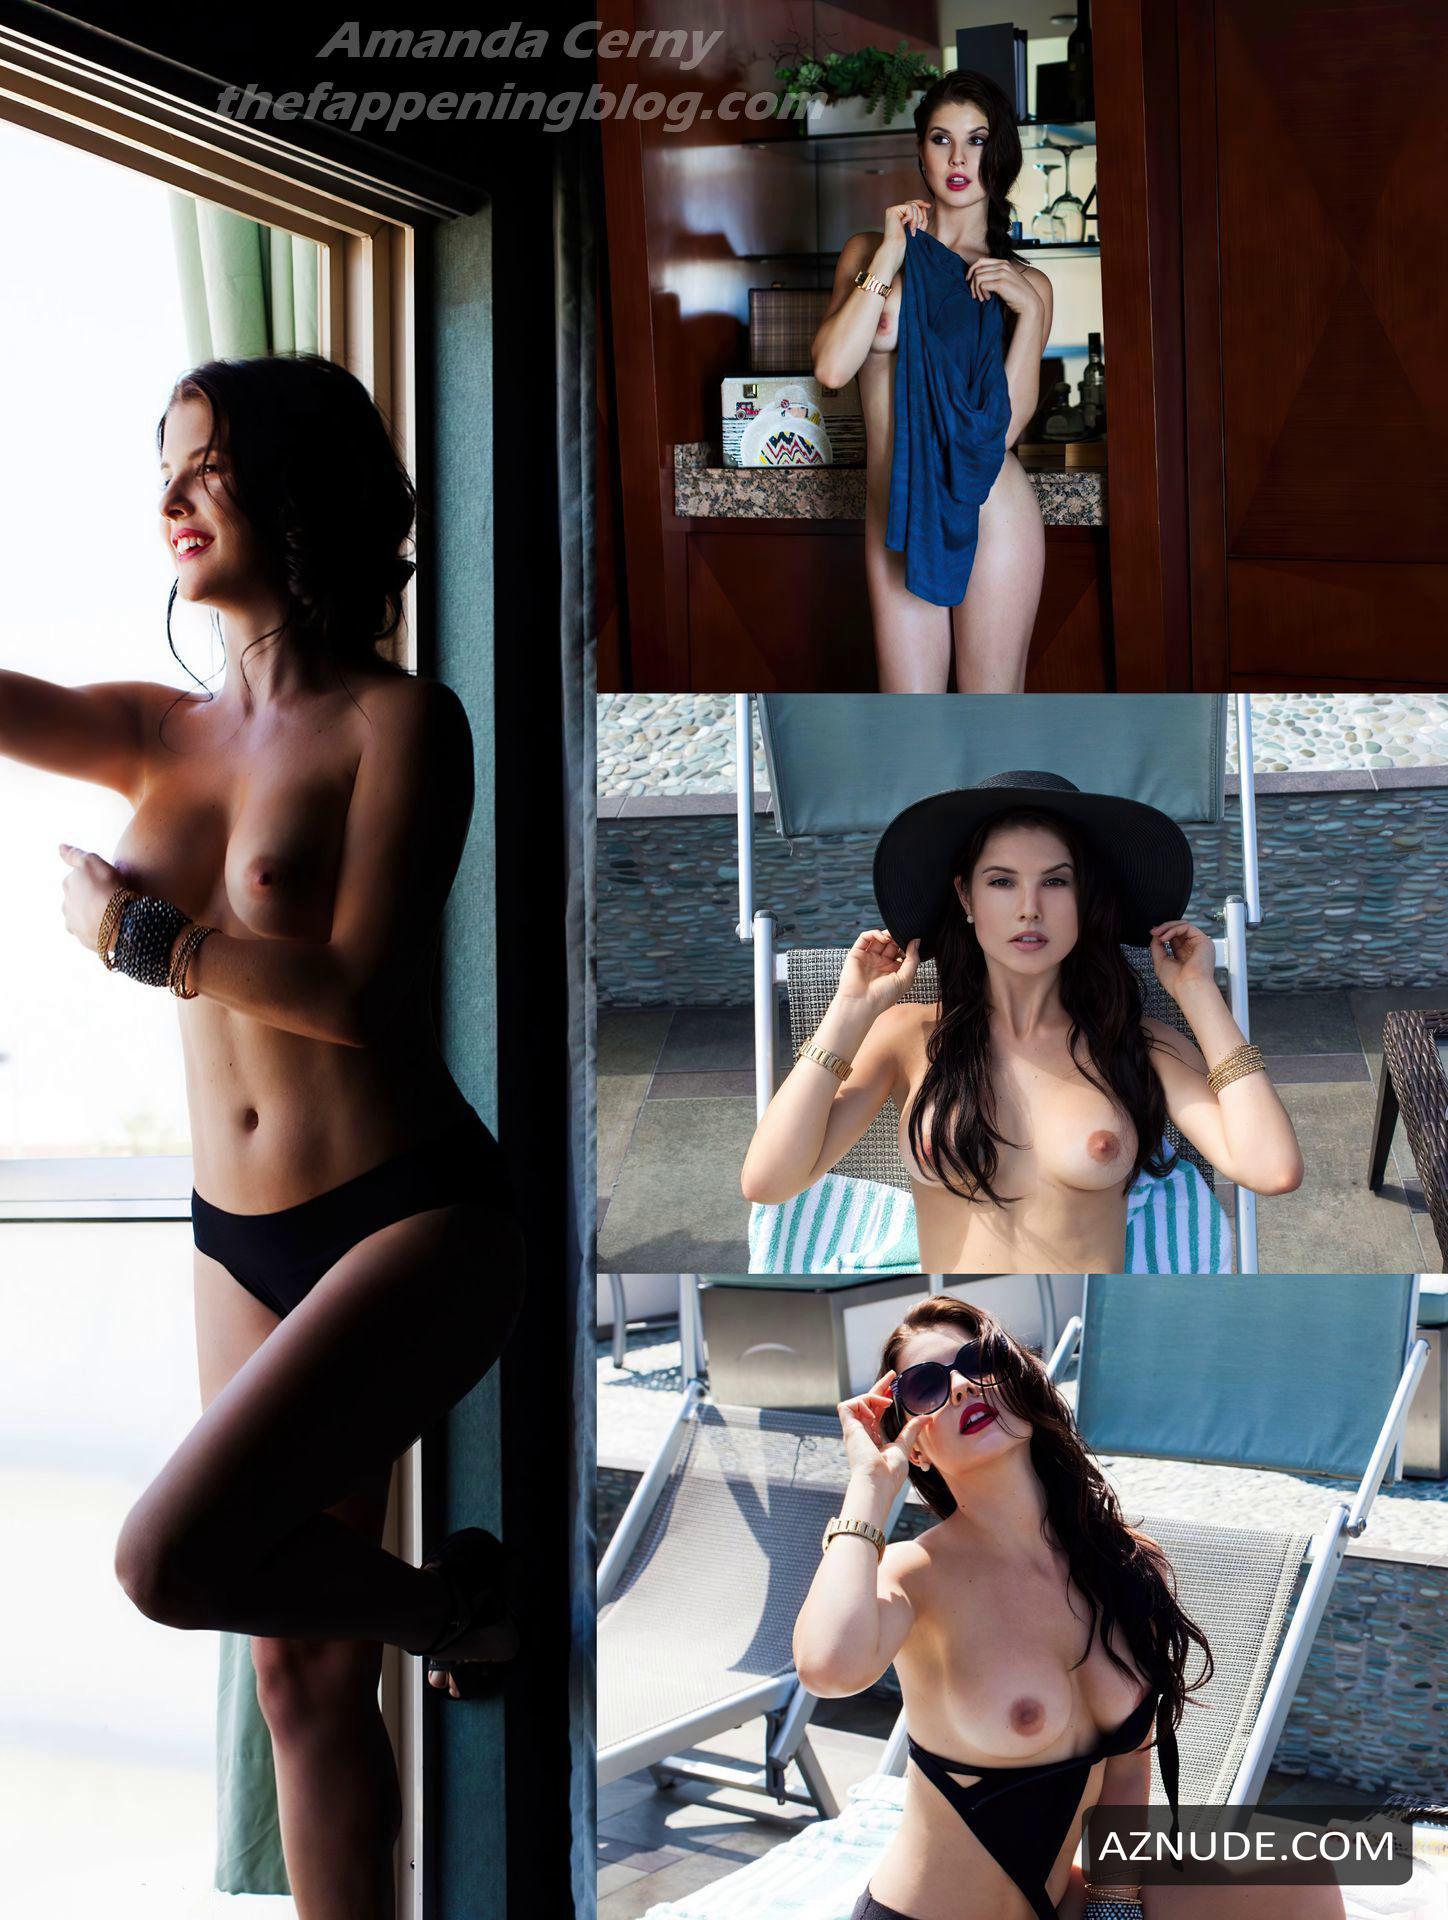 Amanda Cernys Boobs : amanda, cernys, boobs, Amanda, Cerny, Showed, Beautiful, Boobs, Photoshoot, Playboy, AZNude